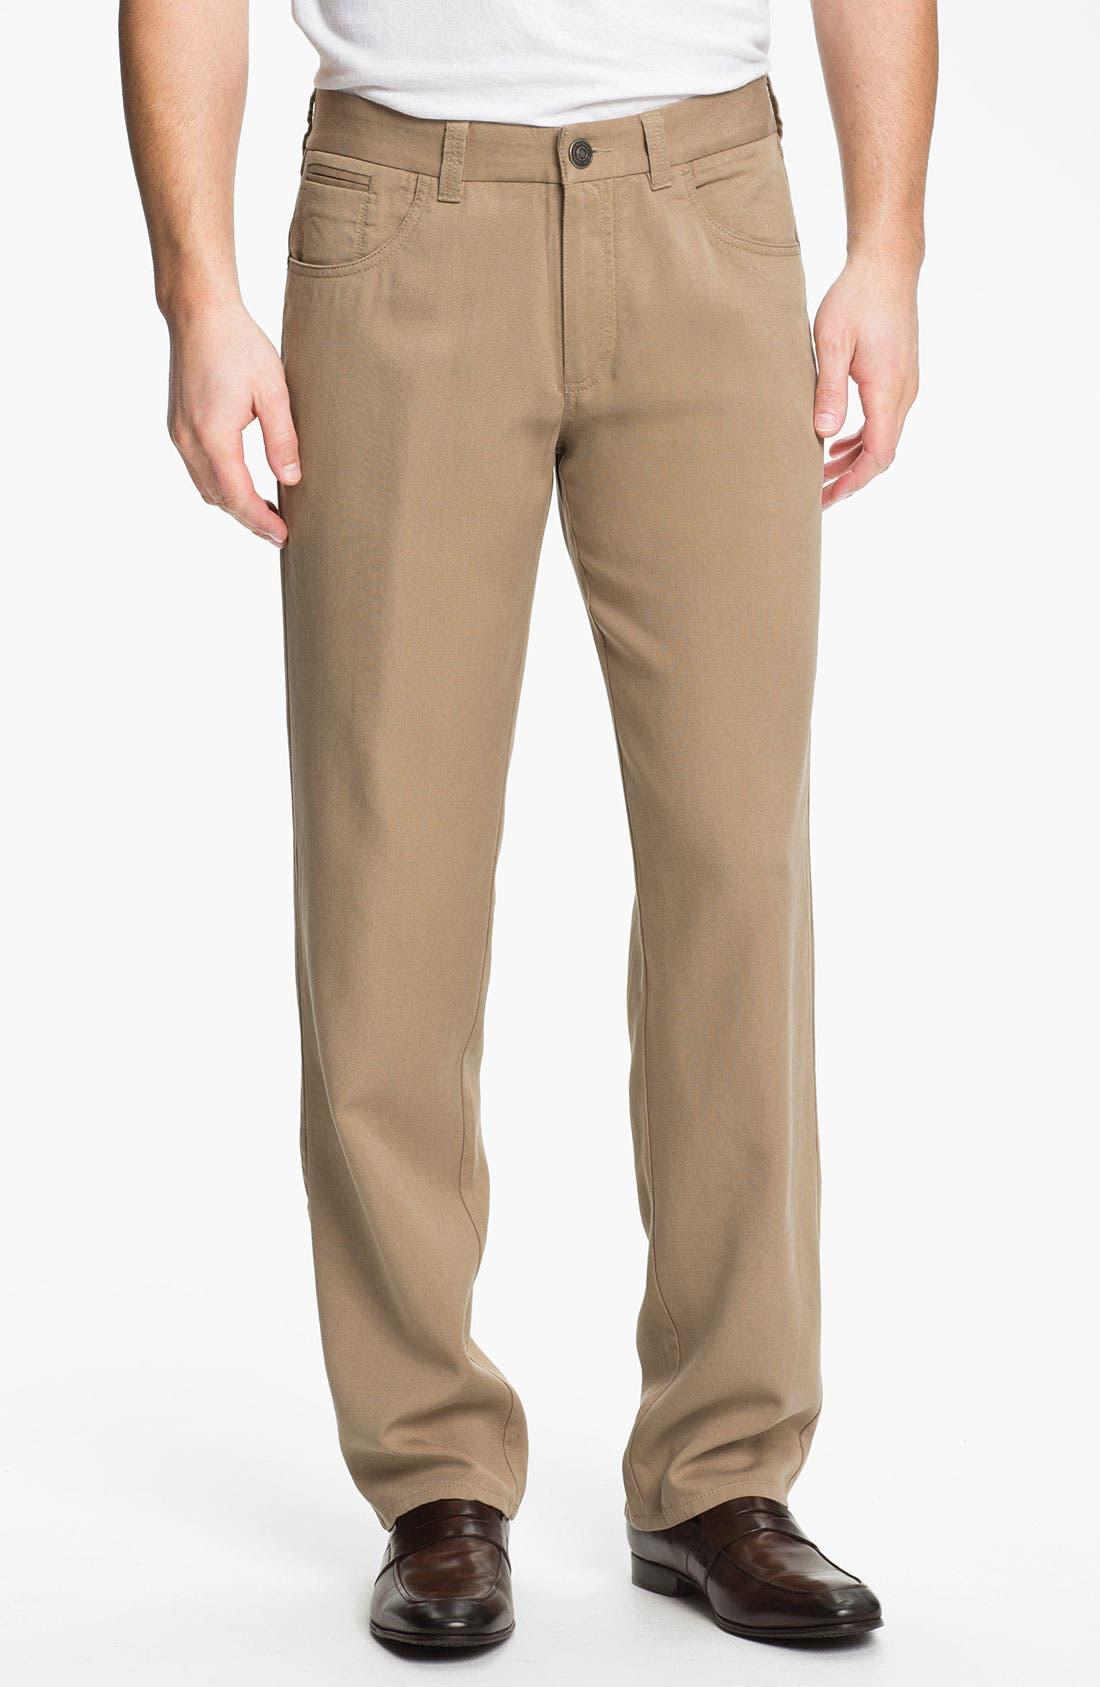 Alternate Image 1 Selected - Tommy Bahama 'Bora Bora' Five Pocket Pants